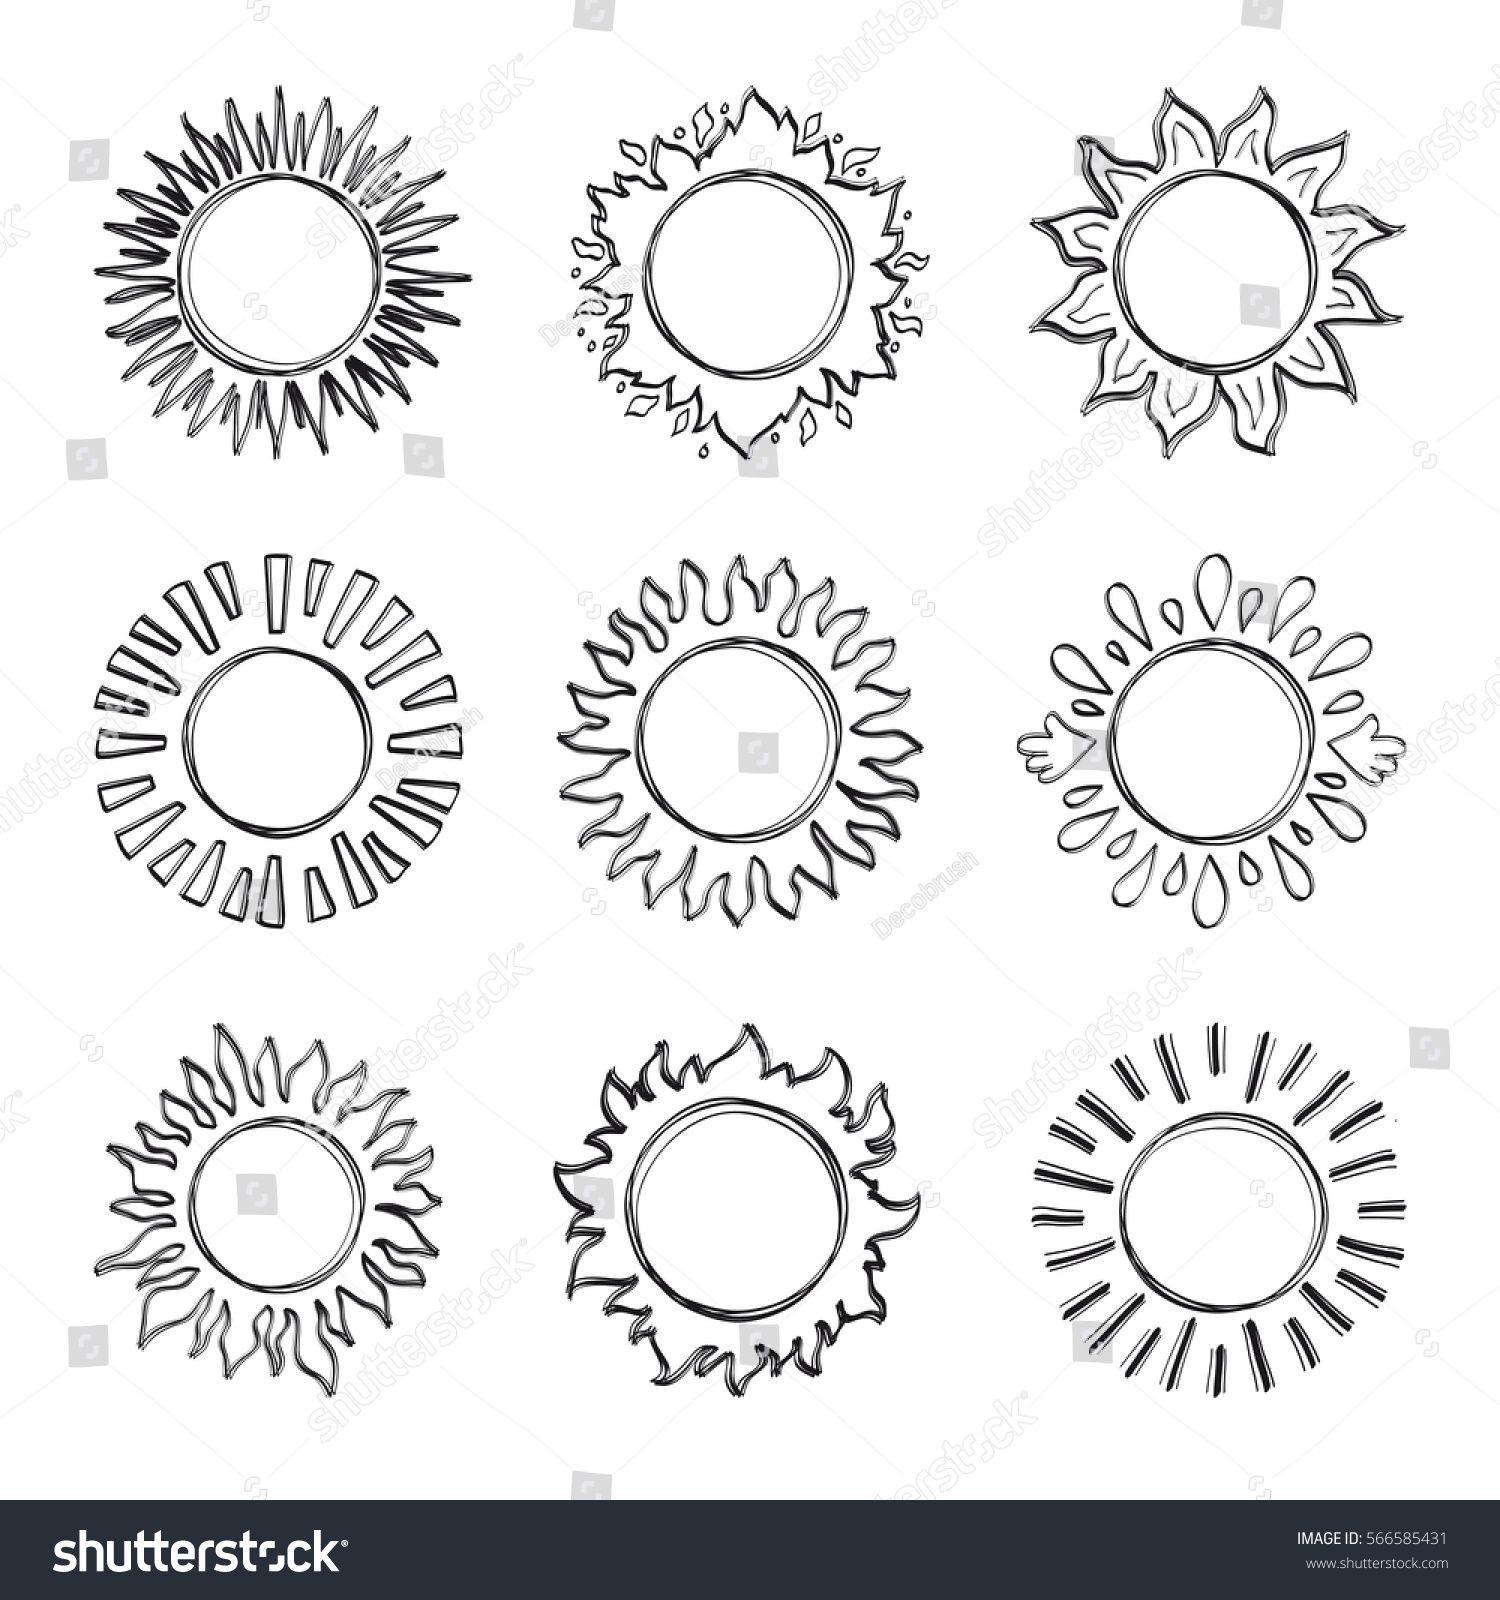 Sketch sun, Hand drawn sunshine symbols. Cute vector doodle suns, Drawing Art illustration   Doodle art flowers, Sun doodles, Sun drawing